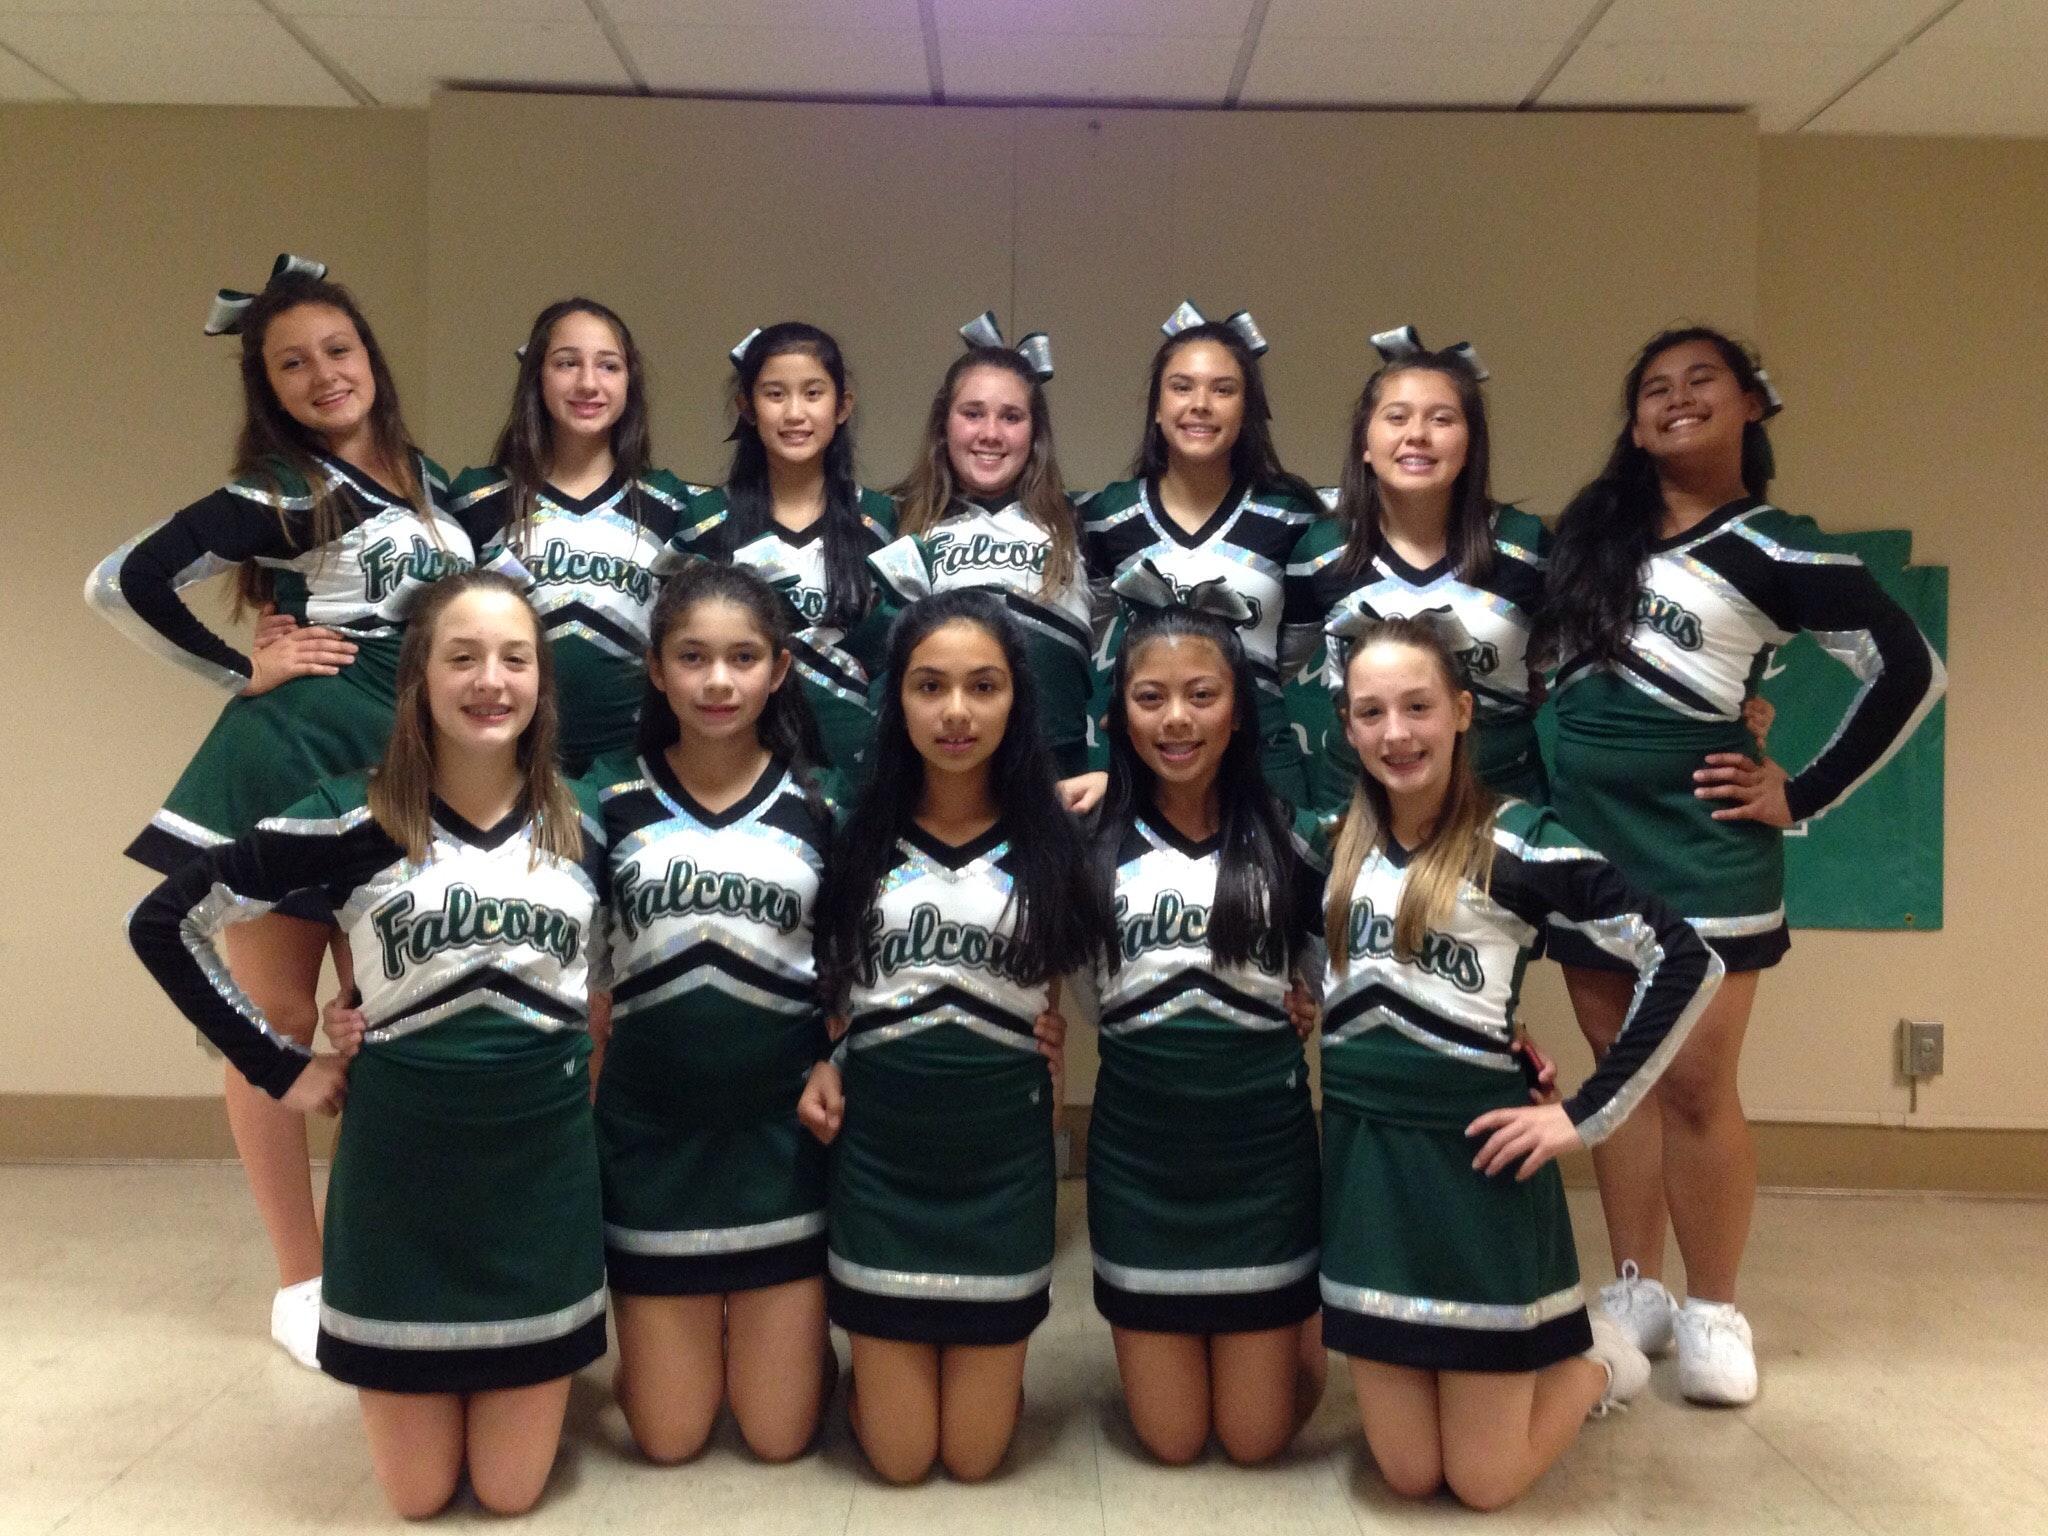 Saint Veronica Cheerleaders